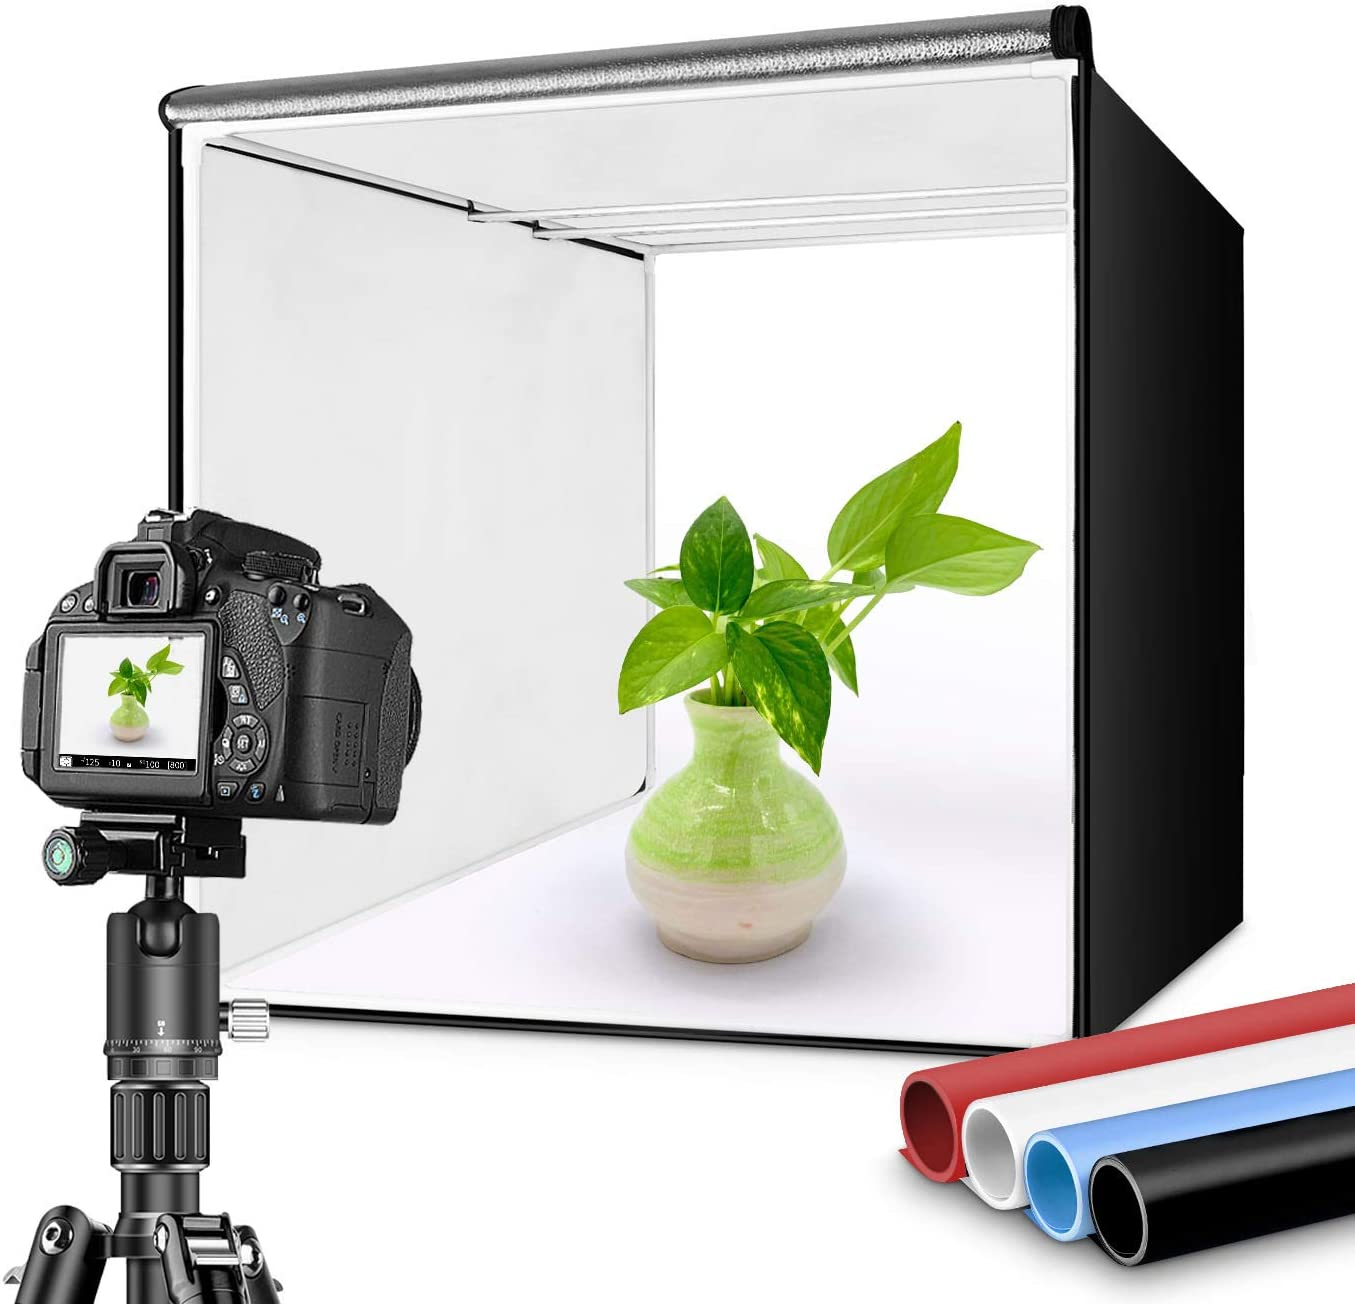 "Travor Photo Box 16""/40cm Photo Studio Light Box Portable Photography Shooting Tent with Movable LED Lights, Dimmable Table Top Light Tent with 4 Color Backdrops (White Black Red Blue), CRI95+"